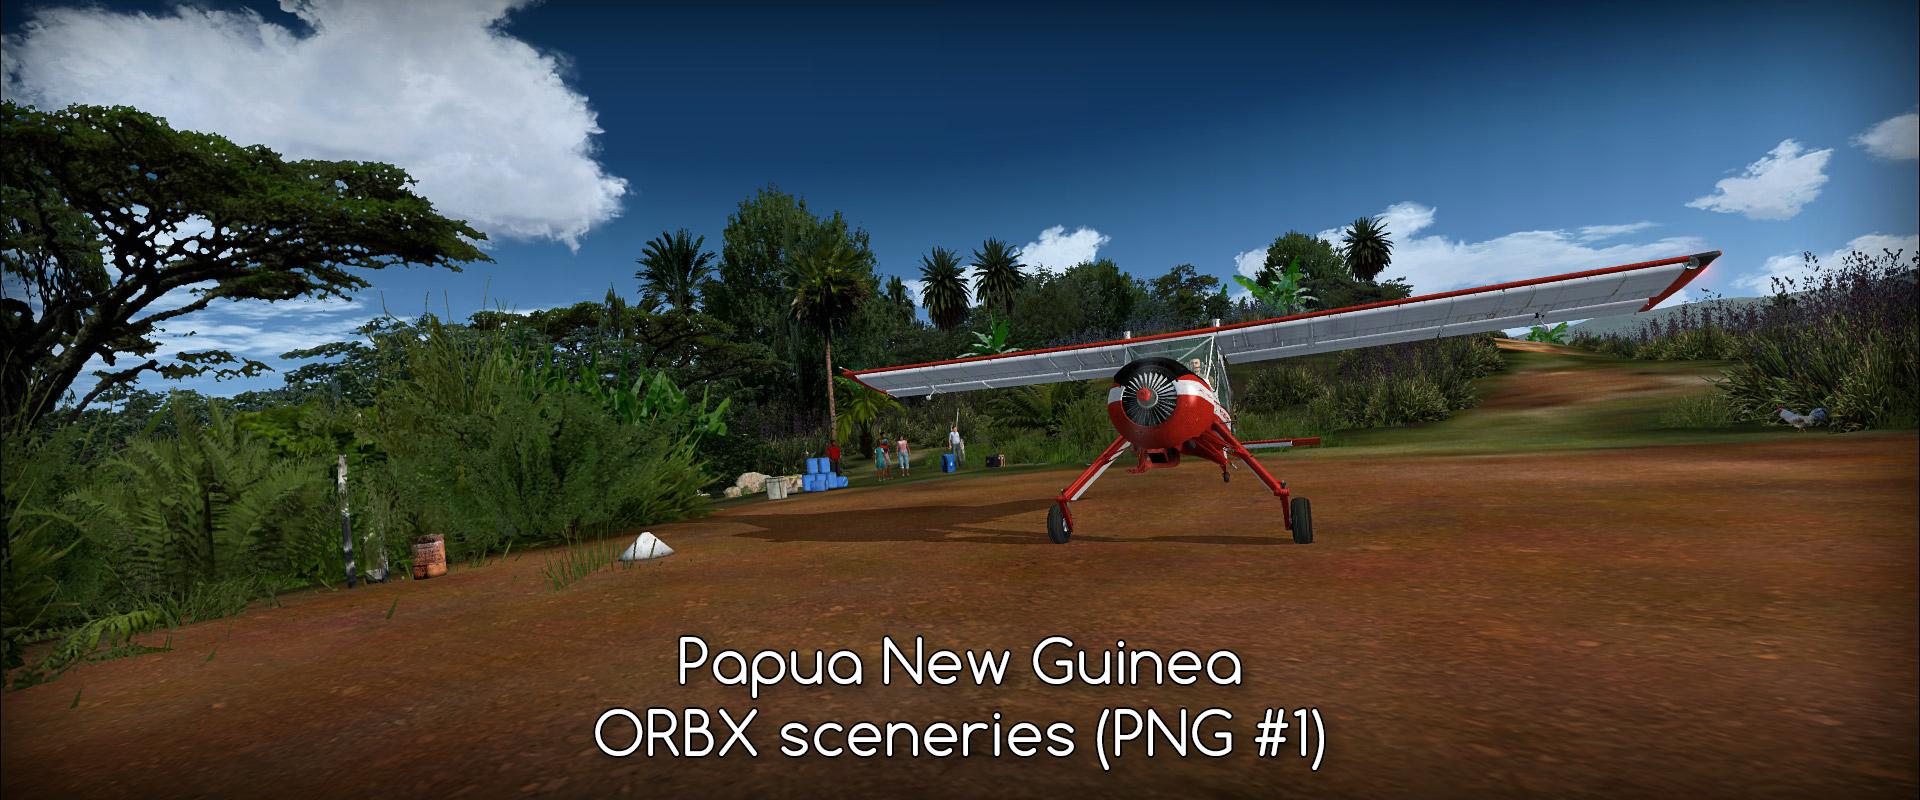 PNG #1 - Papua New Guinea - ORBX sceneries